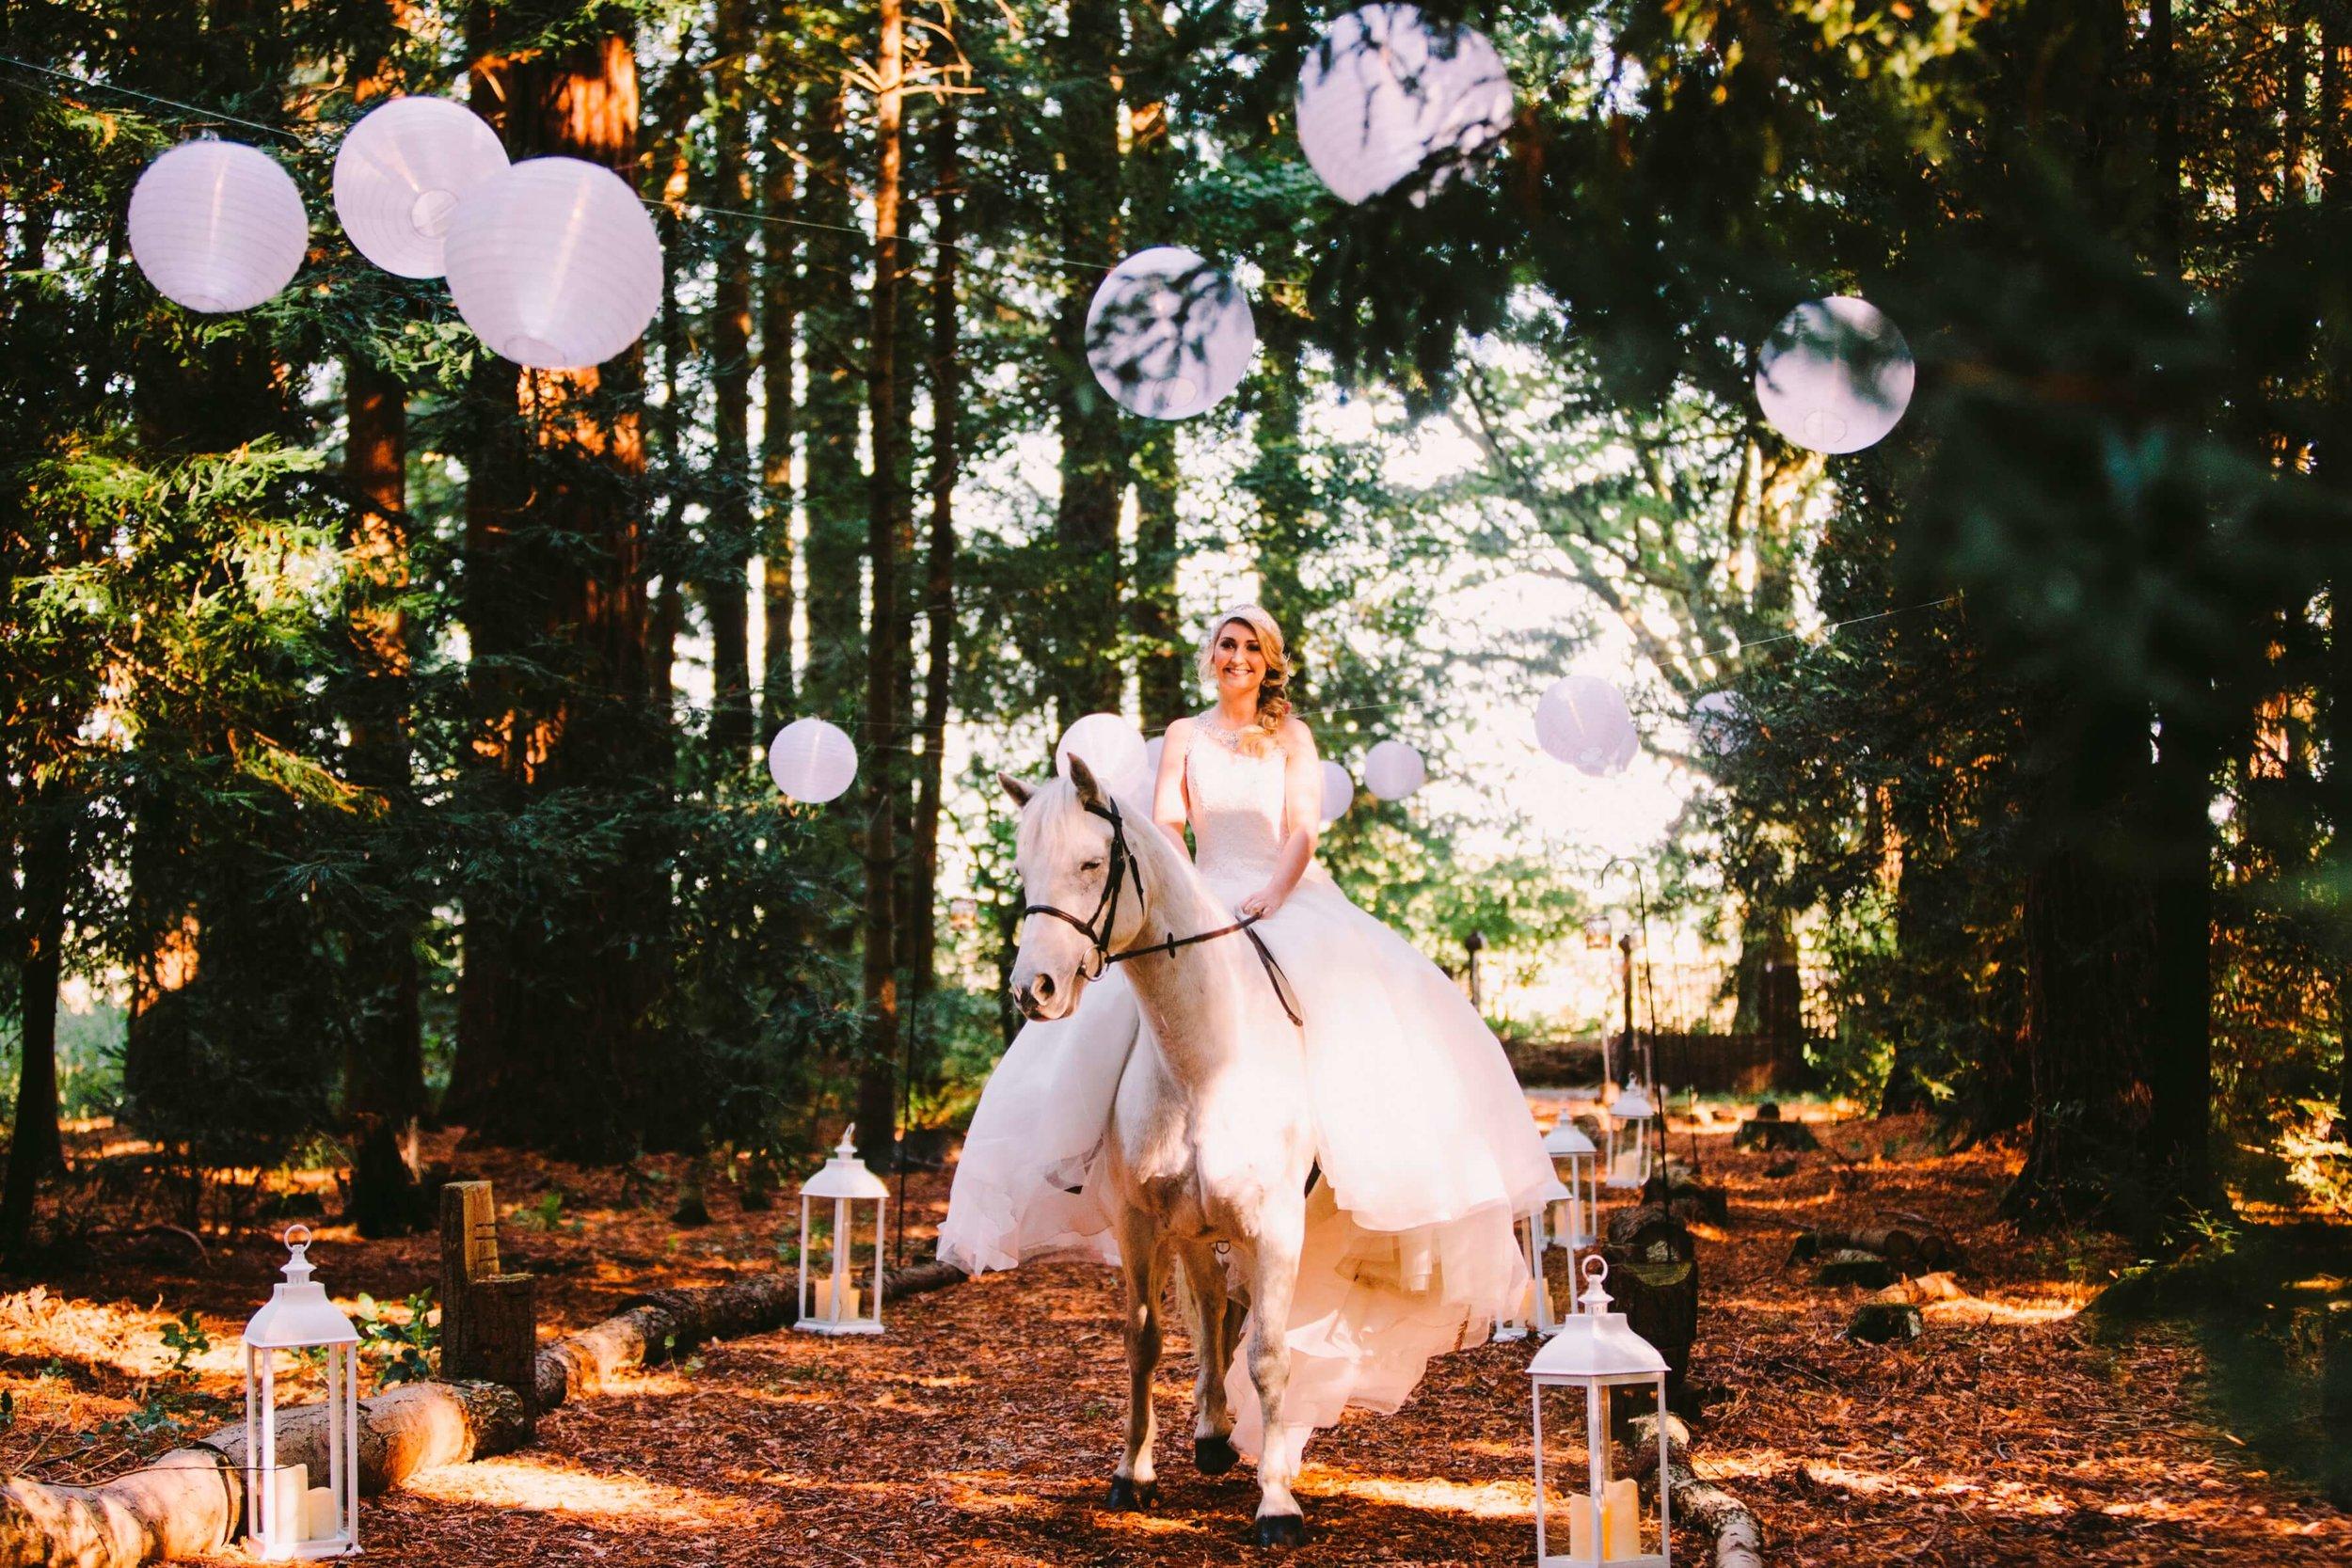 Woodlands wedding outdoor wedding fairy tale wedding